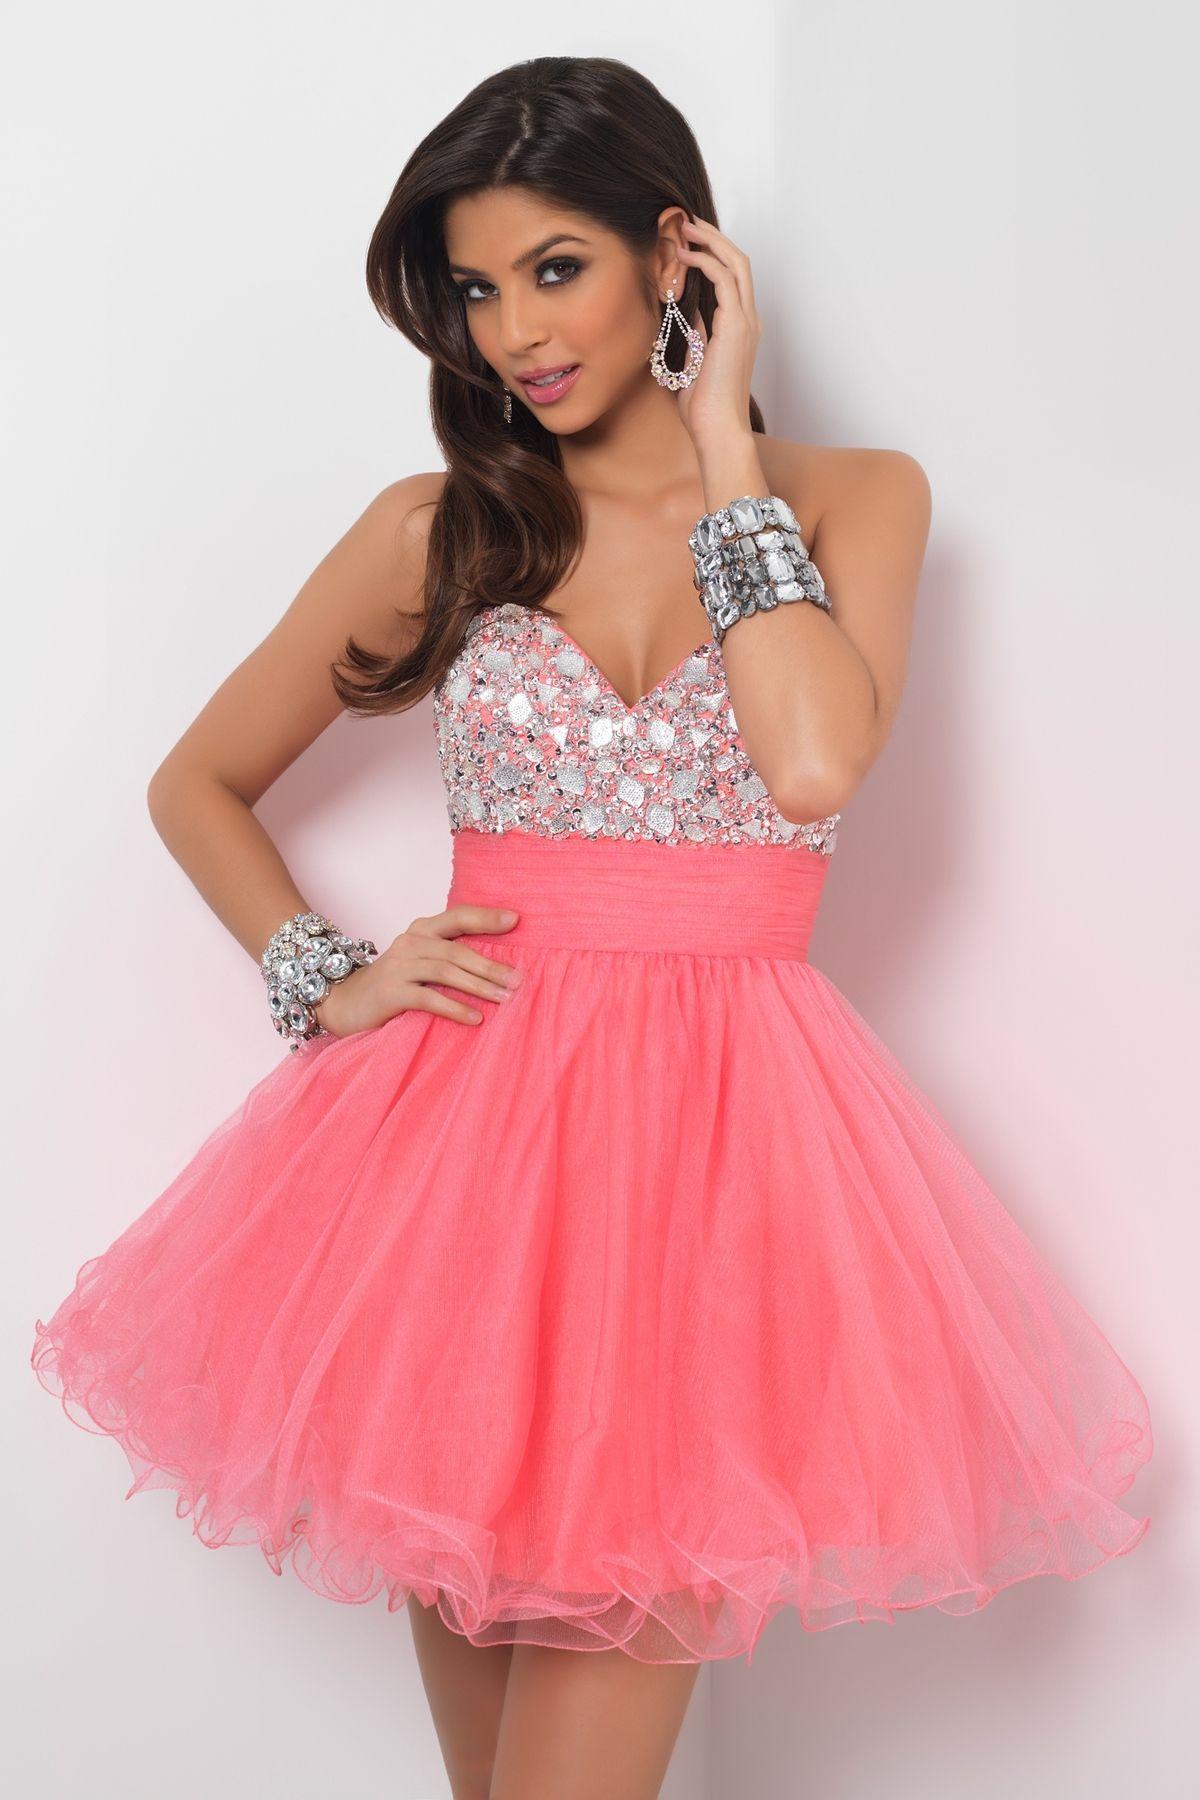 17  images about Blush Prom Dresses on Pinterest  Blush dresses ...